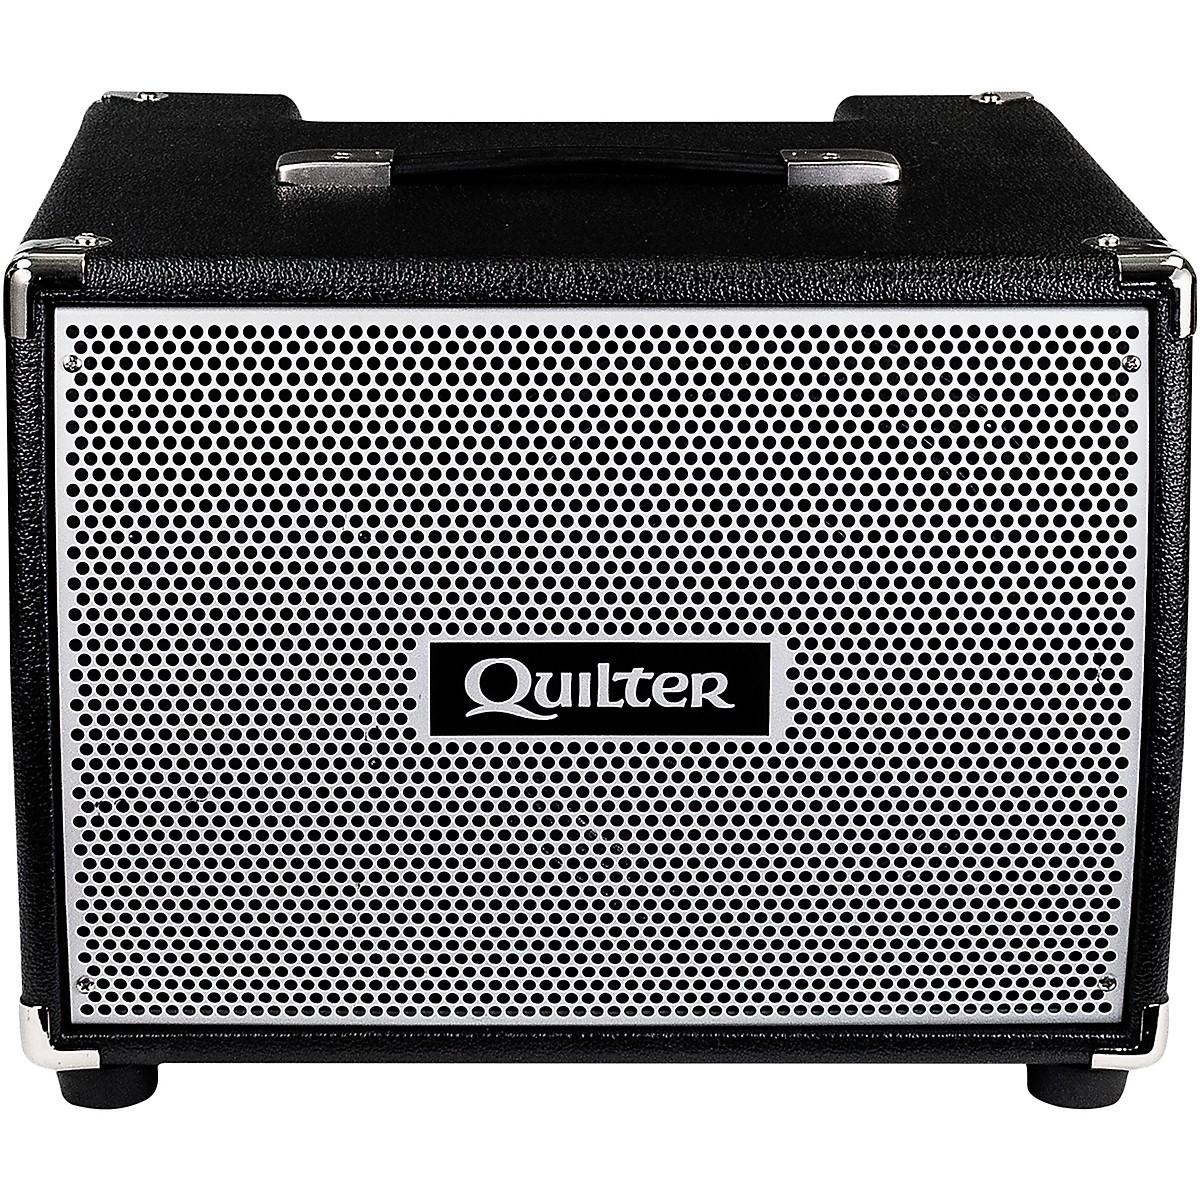 Quilter Labs BassDock BD10 400W 1x10 Bass Speaker Cab